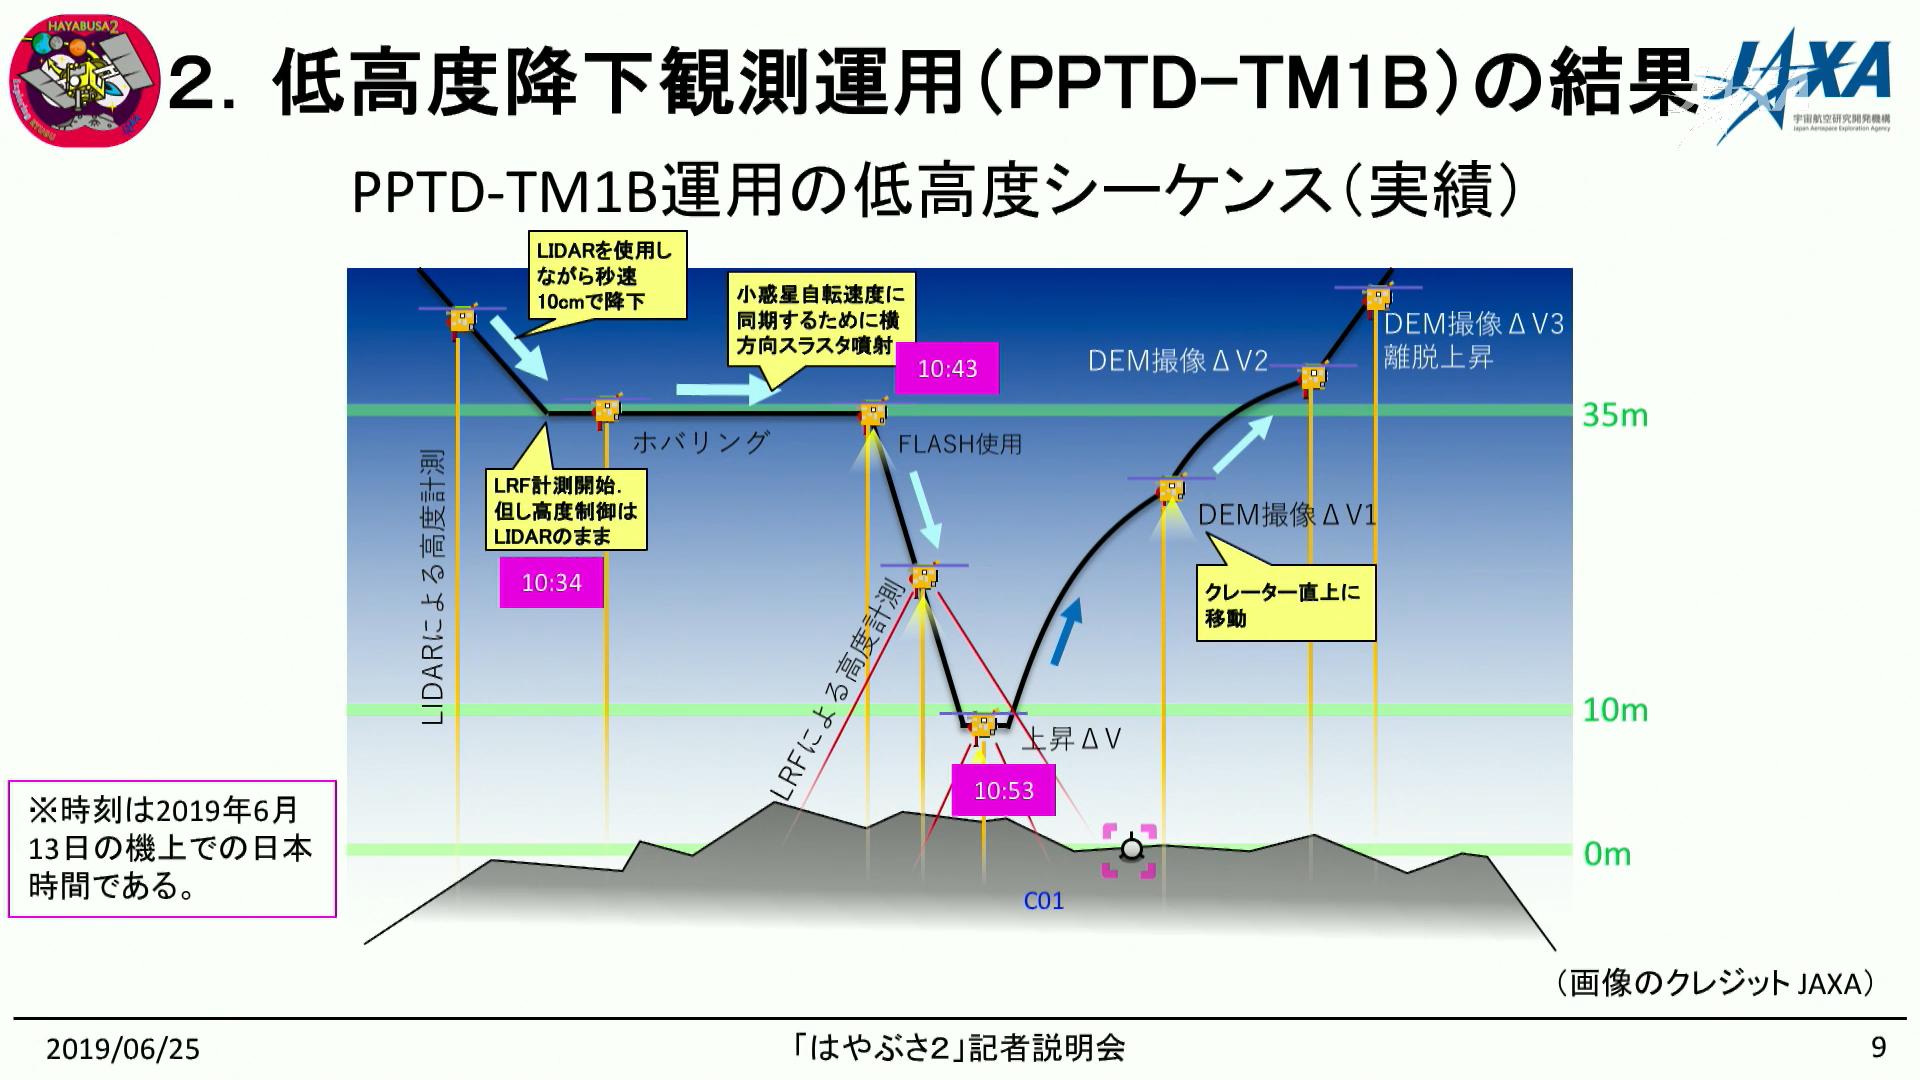 f:id:Imamura:20190625234714p:plain